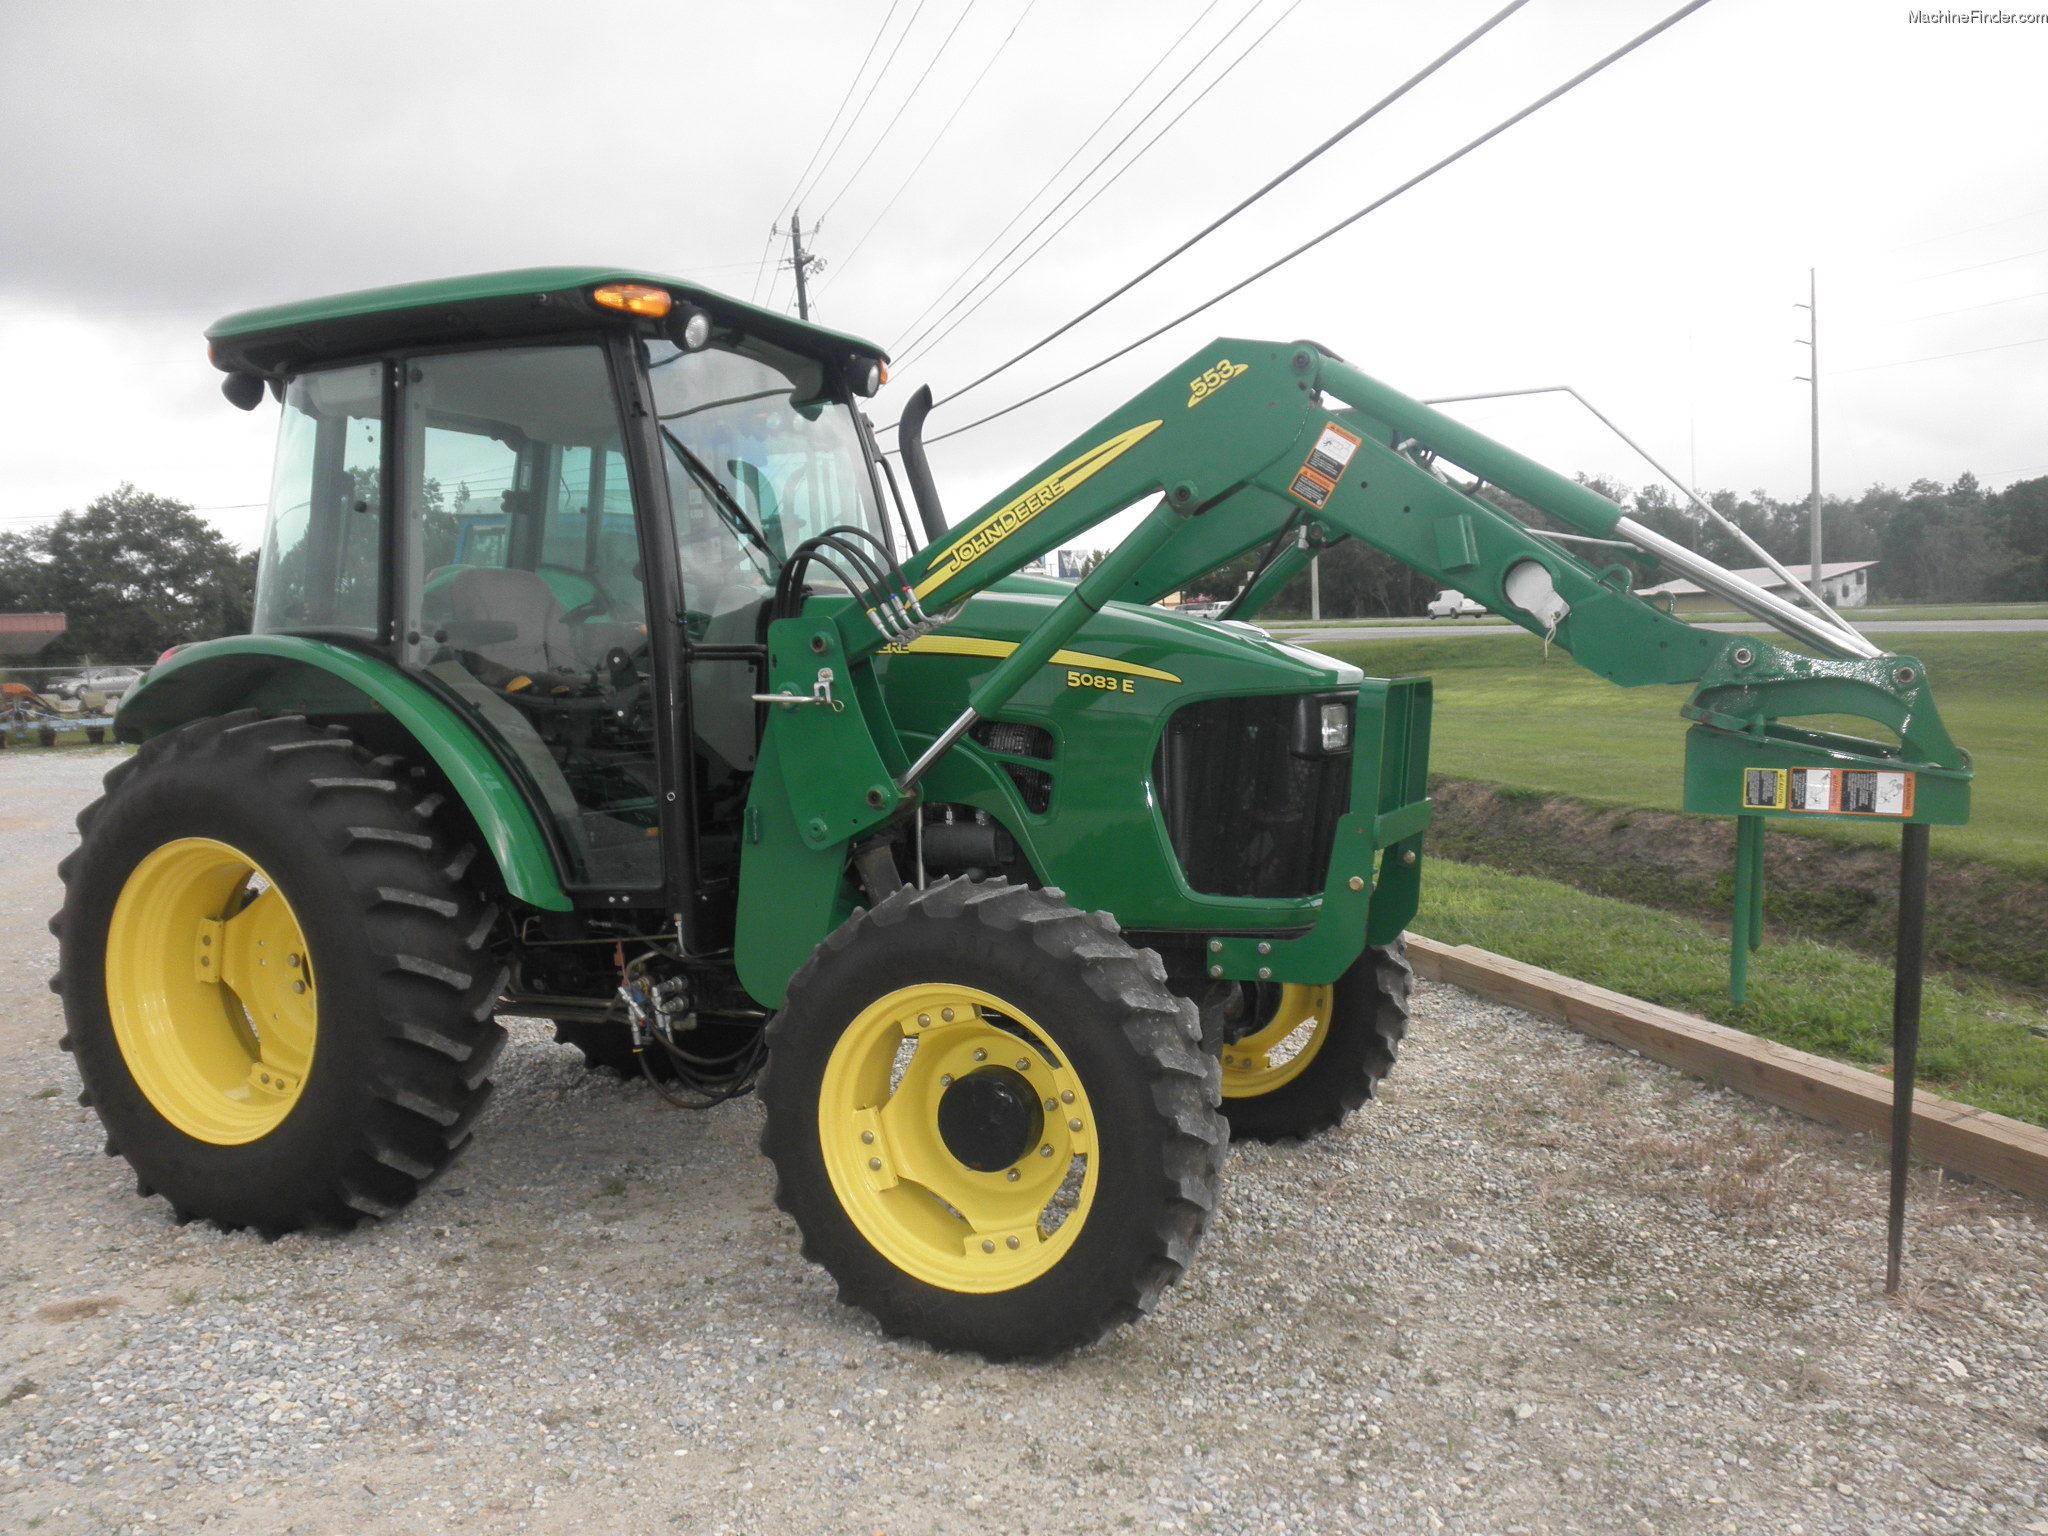 2010 John Deere 3005 Tractors - Compact (1-40hp.) - John ...